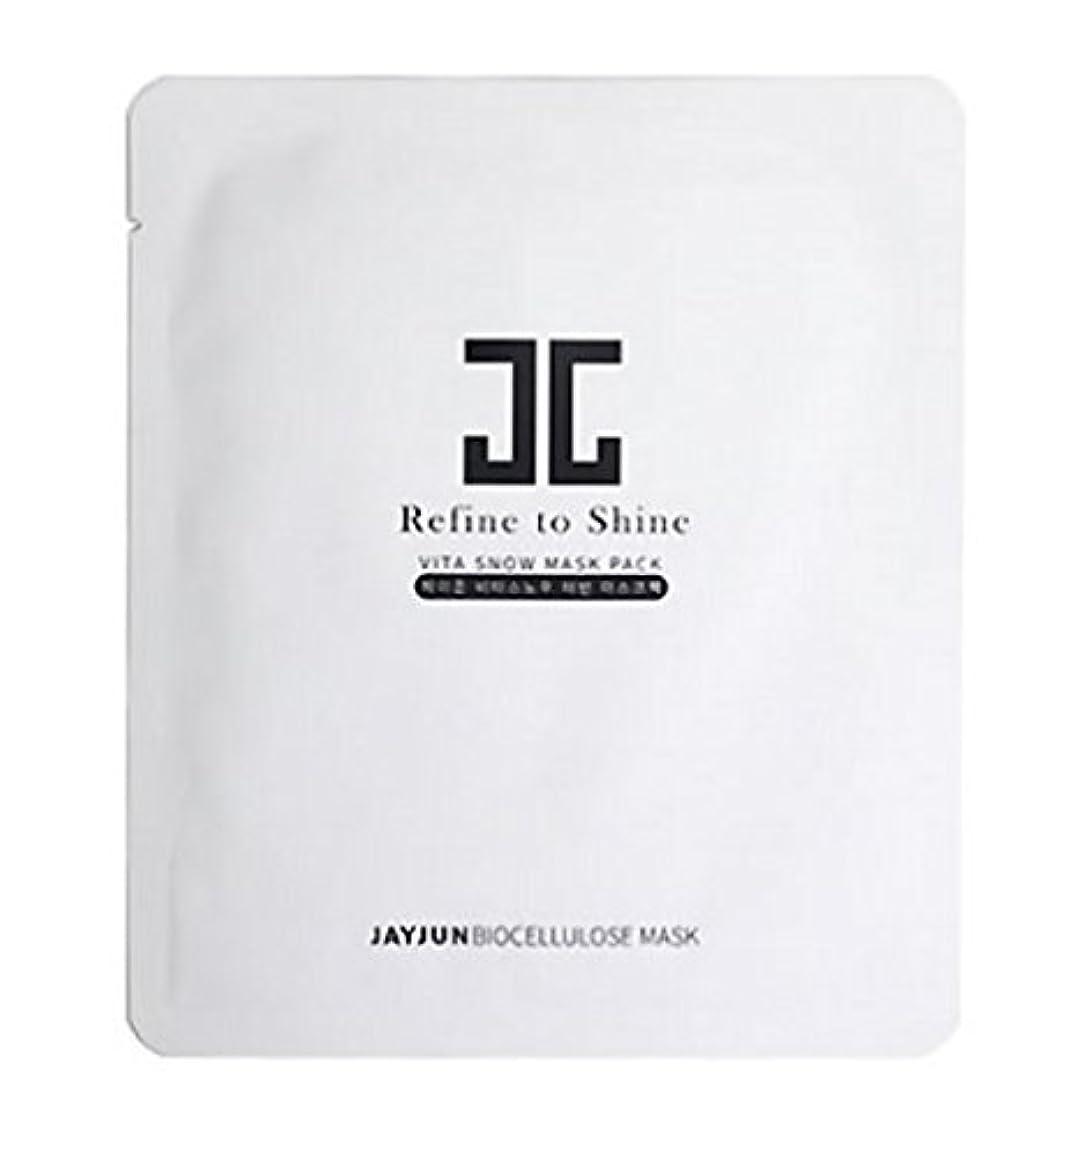 JAYJUN ジェイジュン ヴィタスノー プレミアム バイオセルロース プラセンタフェイシャルマスク[5枚入り]Vita Snow Premium Bio Cellulose placenta Facial Mask [...